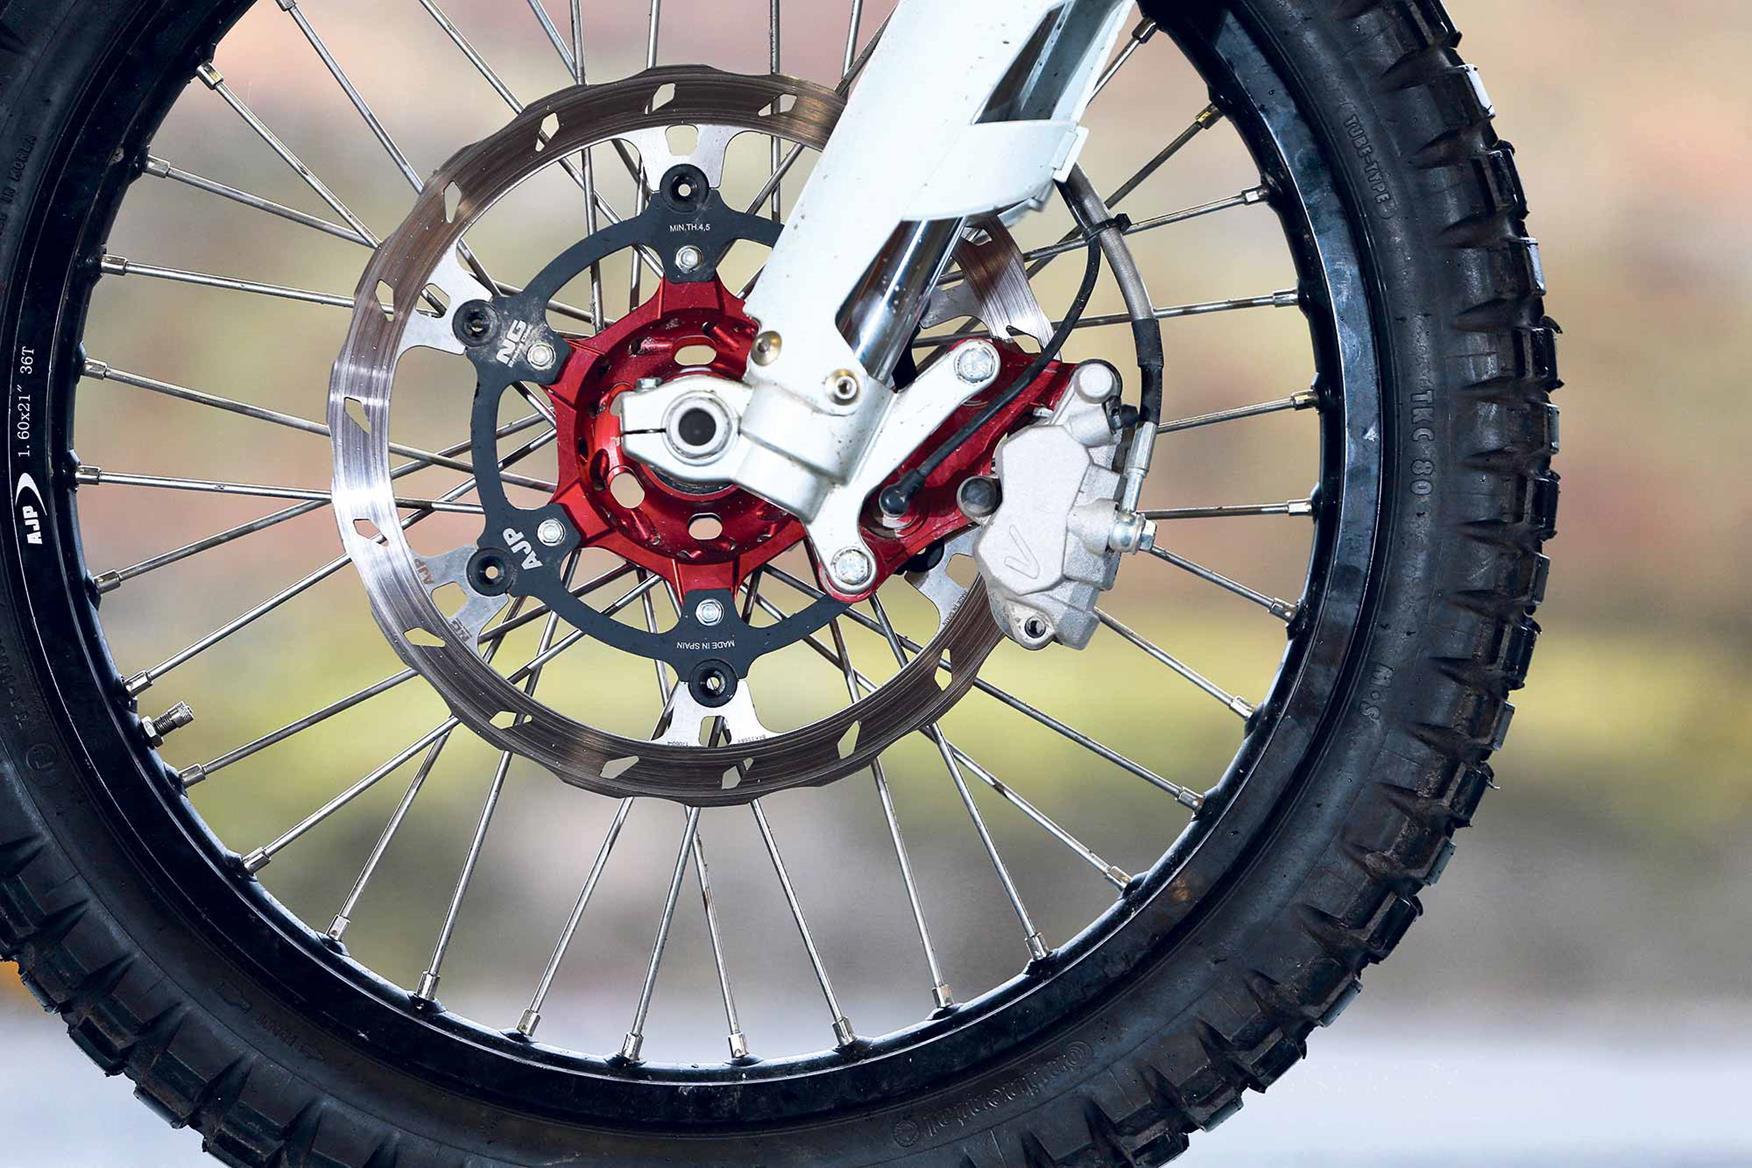 AJP PR7 front brakes